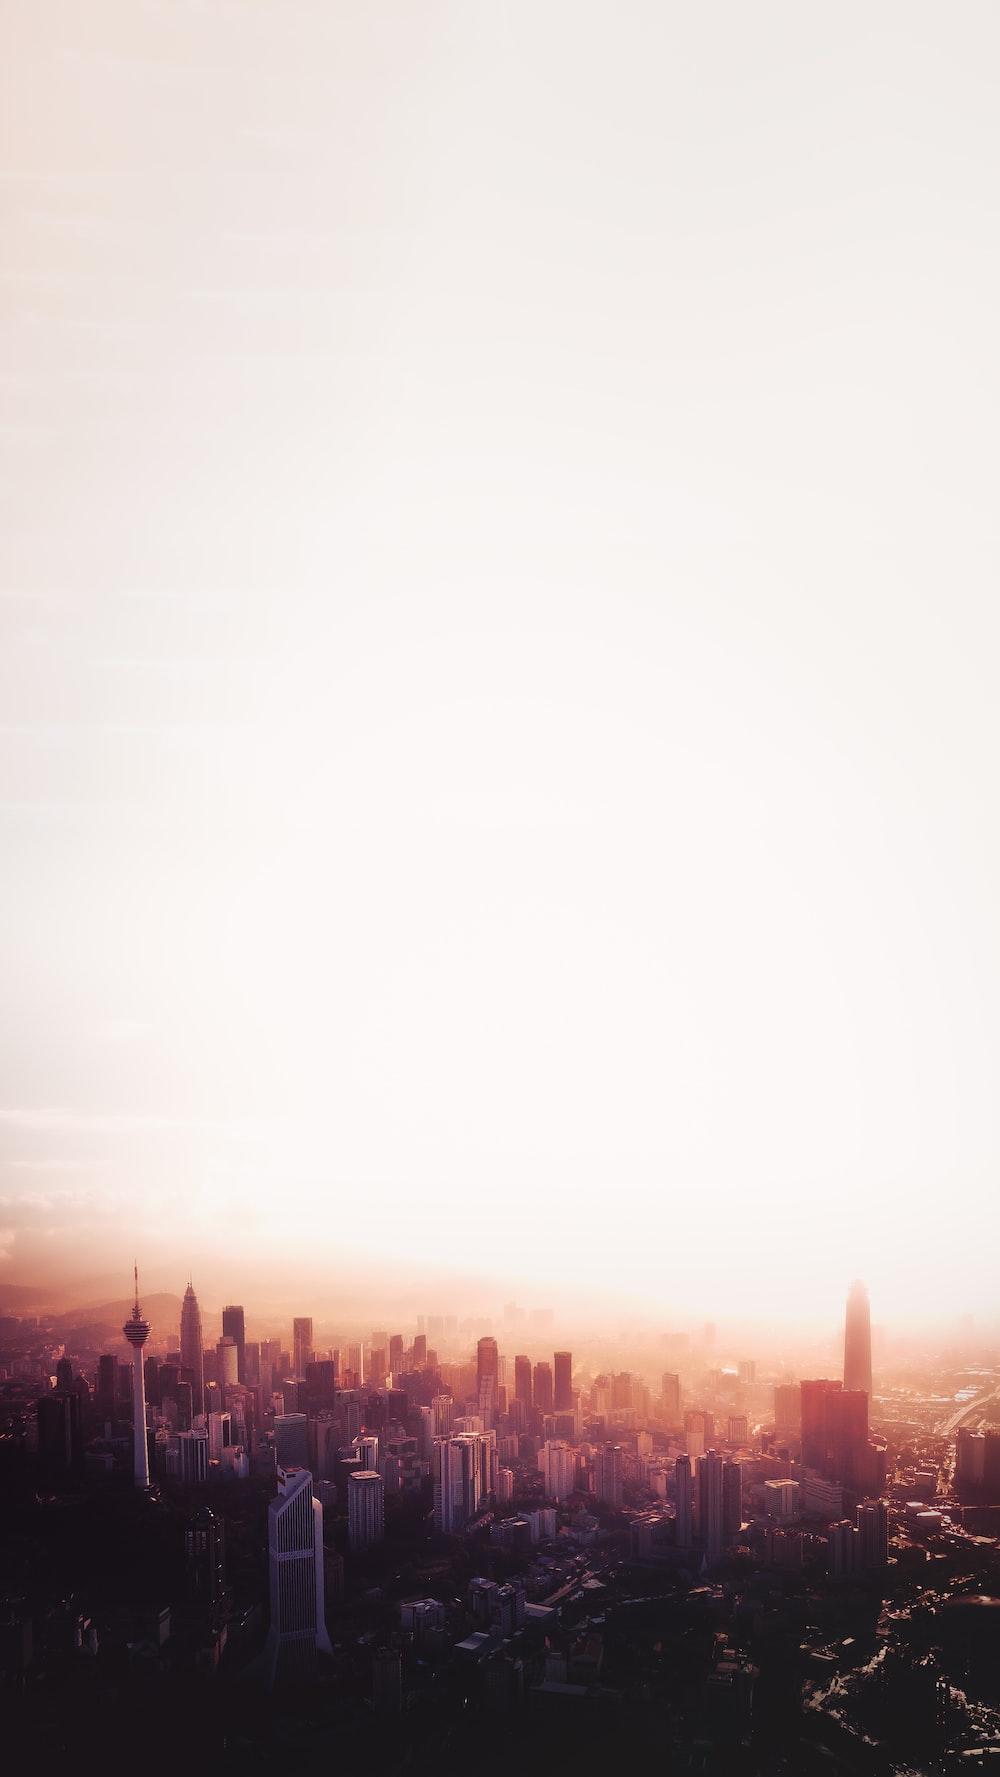 cityscape under white sky